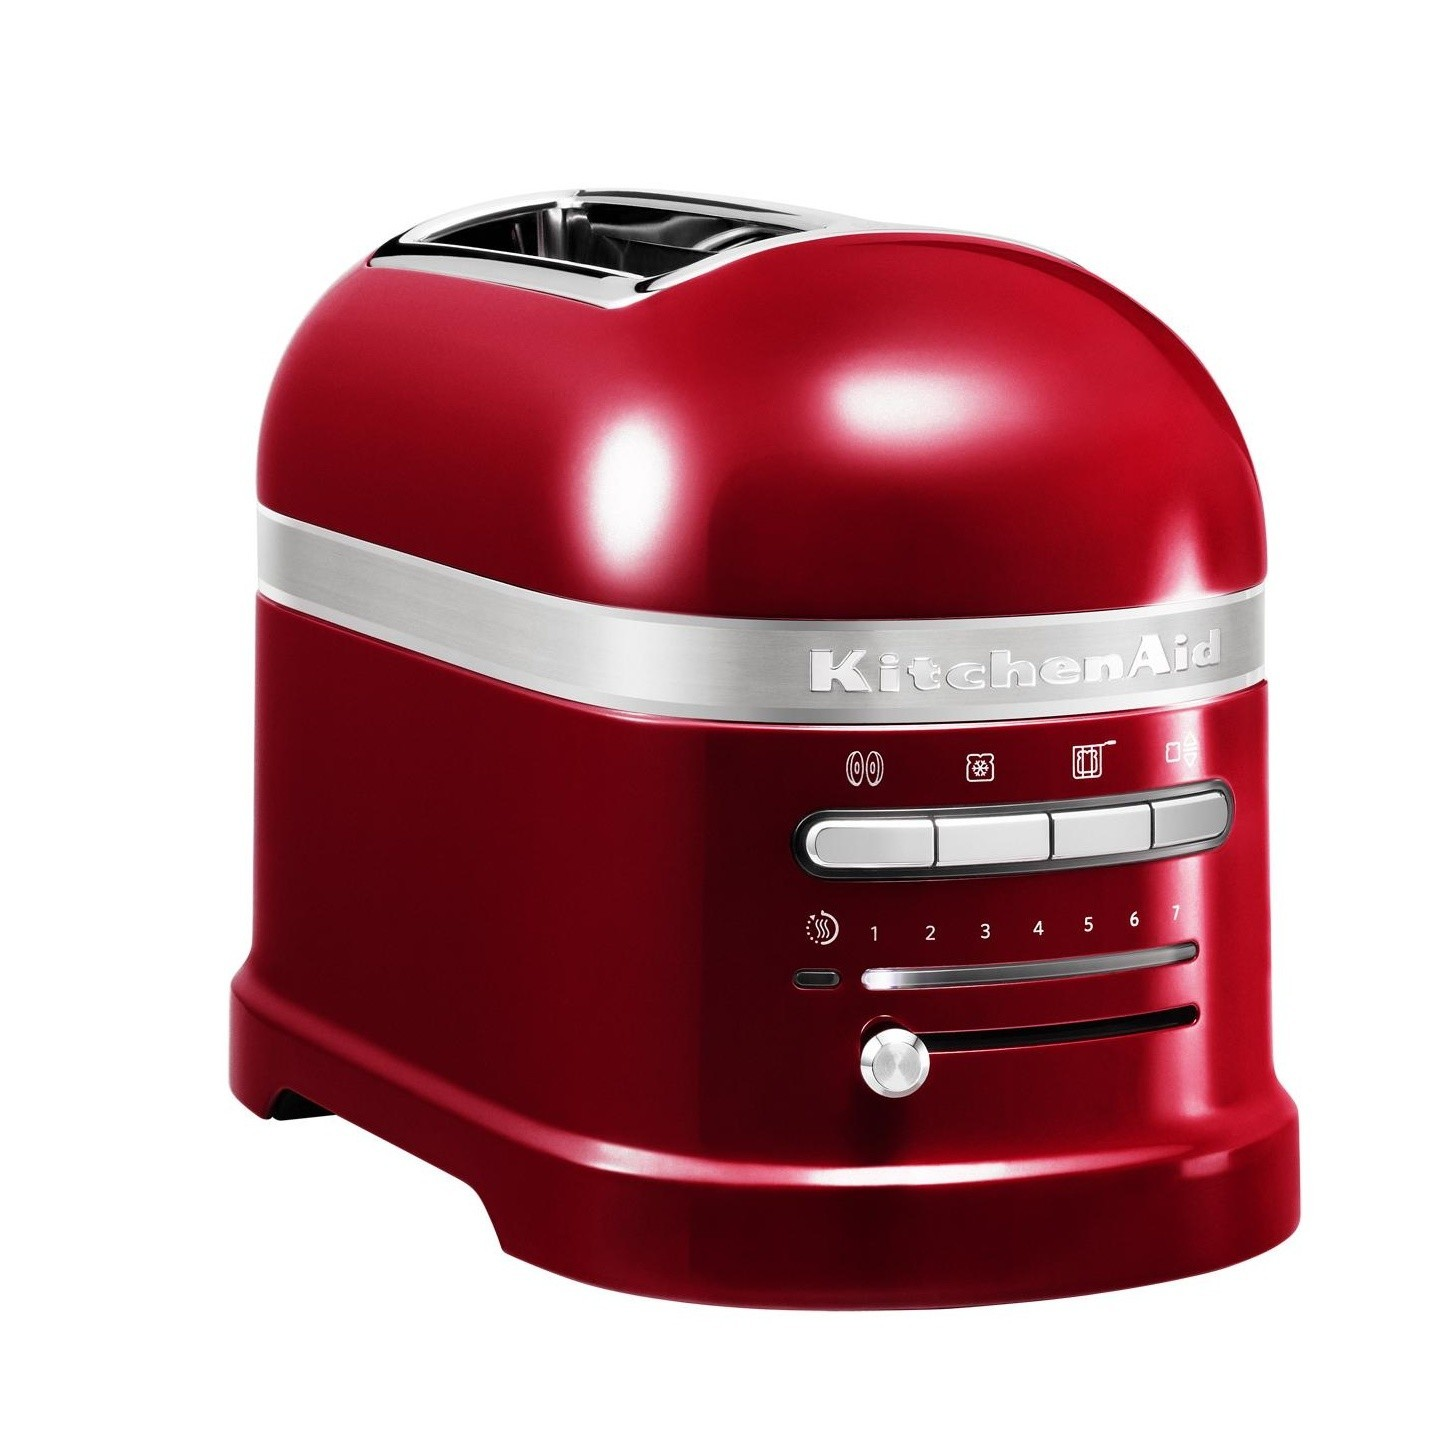 Kitchenaid artisan 185 set